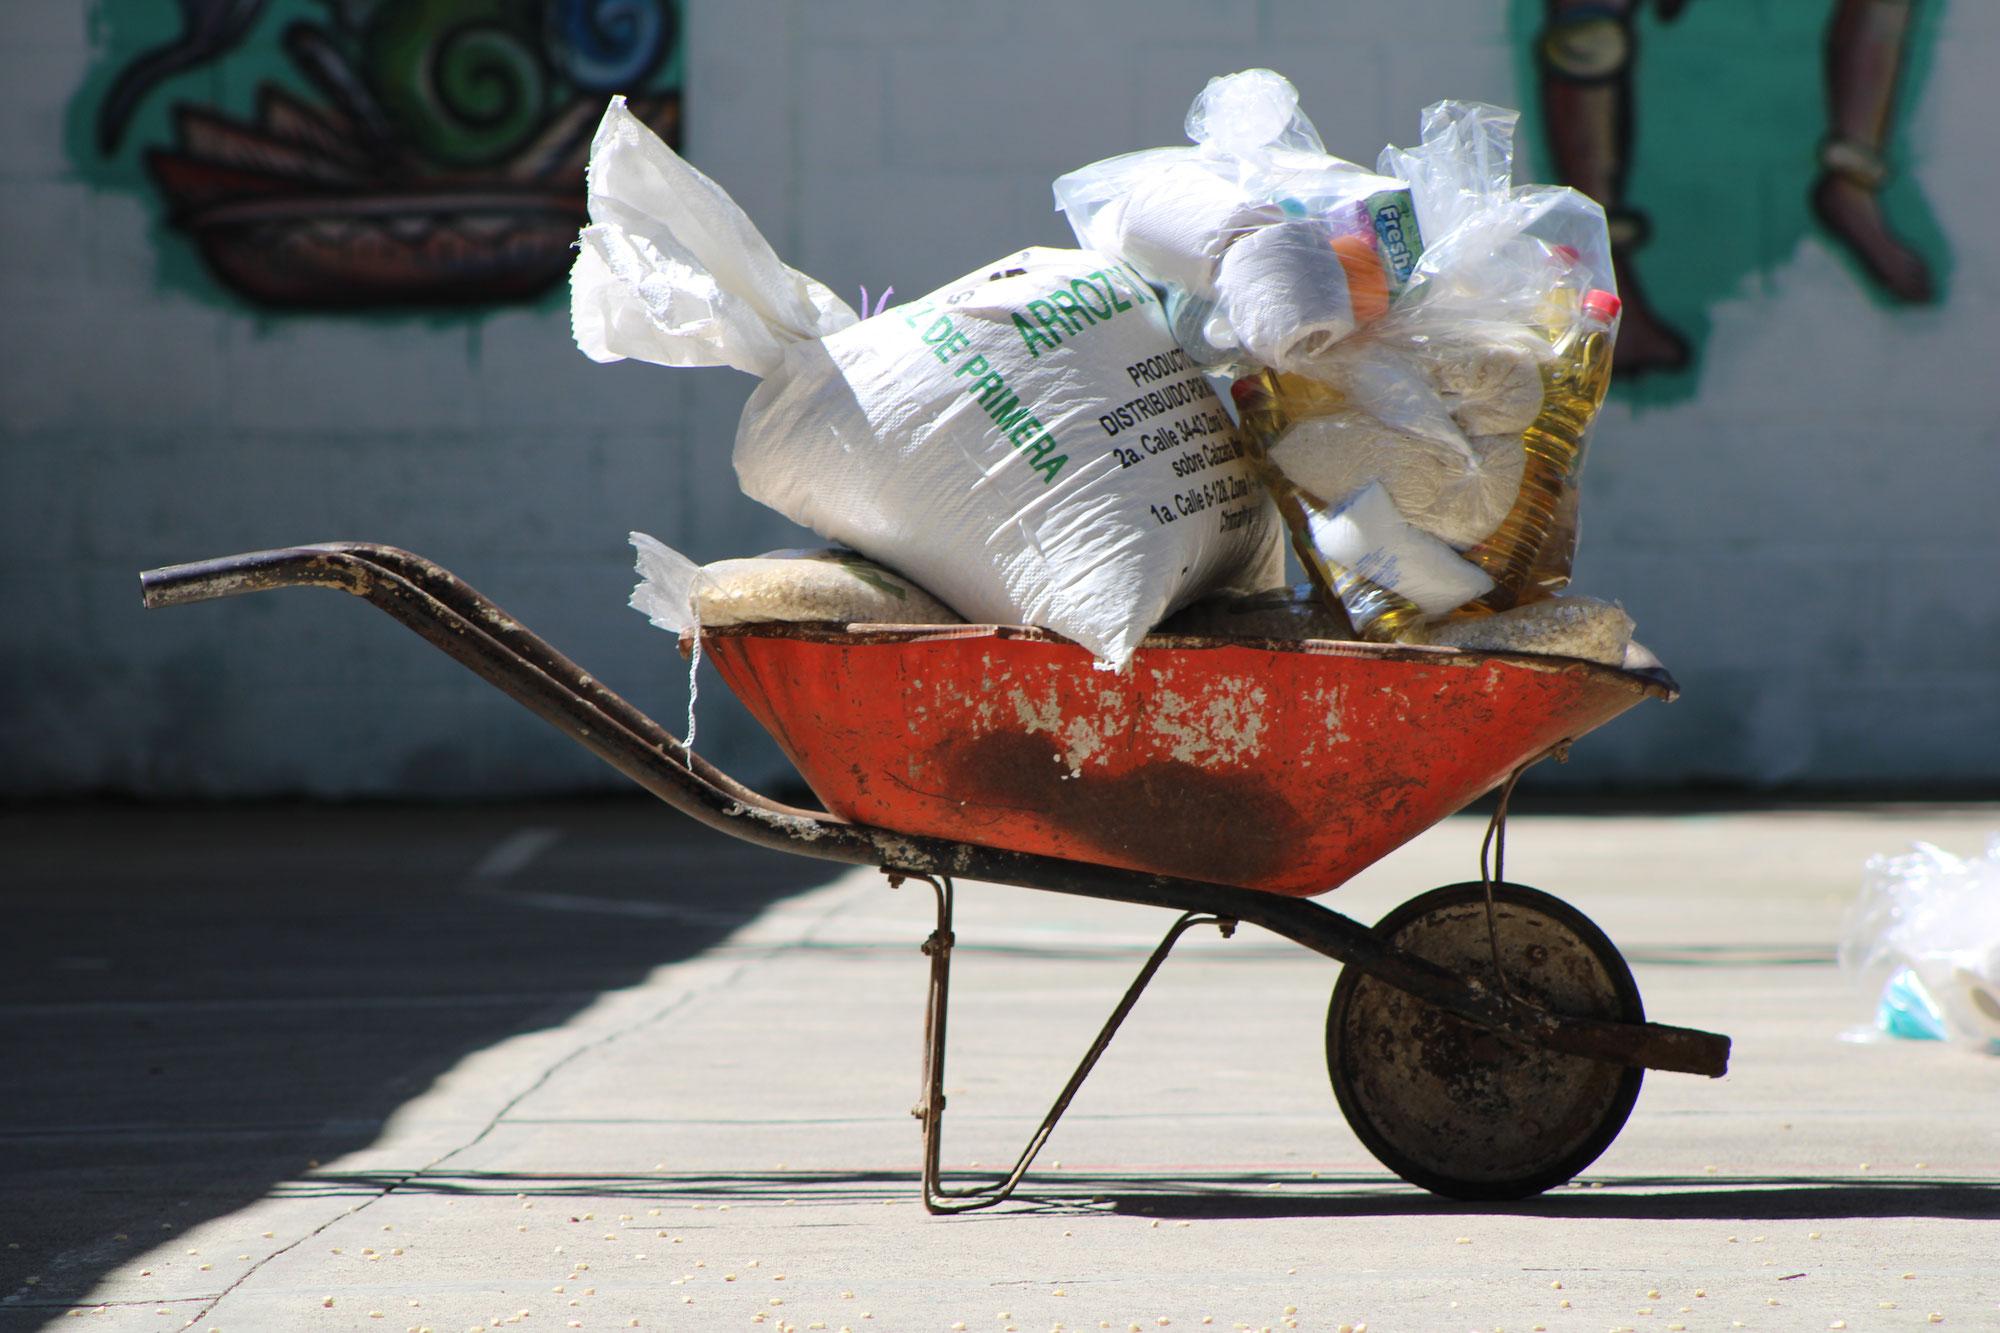 Coronahilfe: Erneut Lebensmittelpakete im Armenviertel Las Rosas verteilt